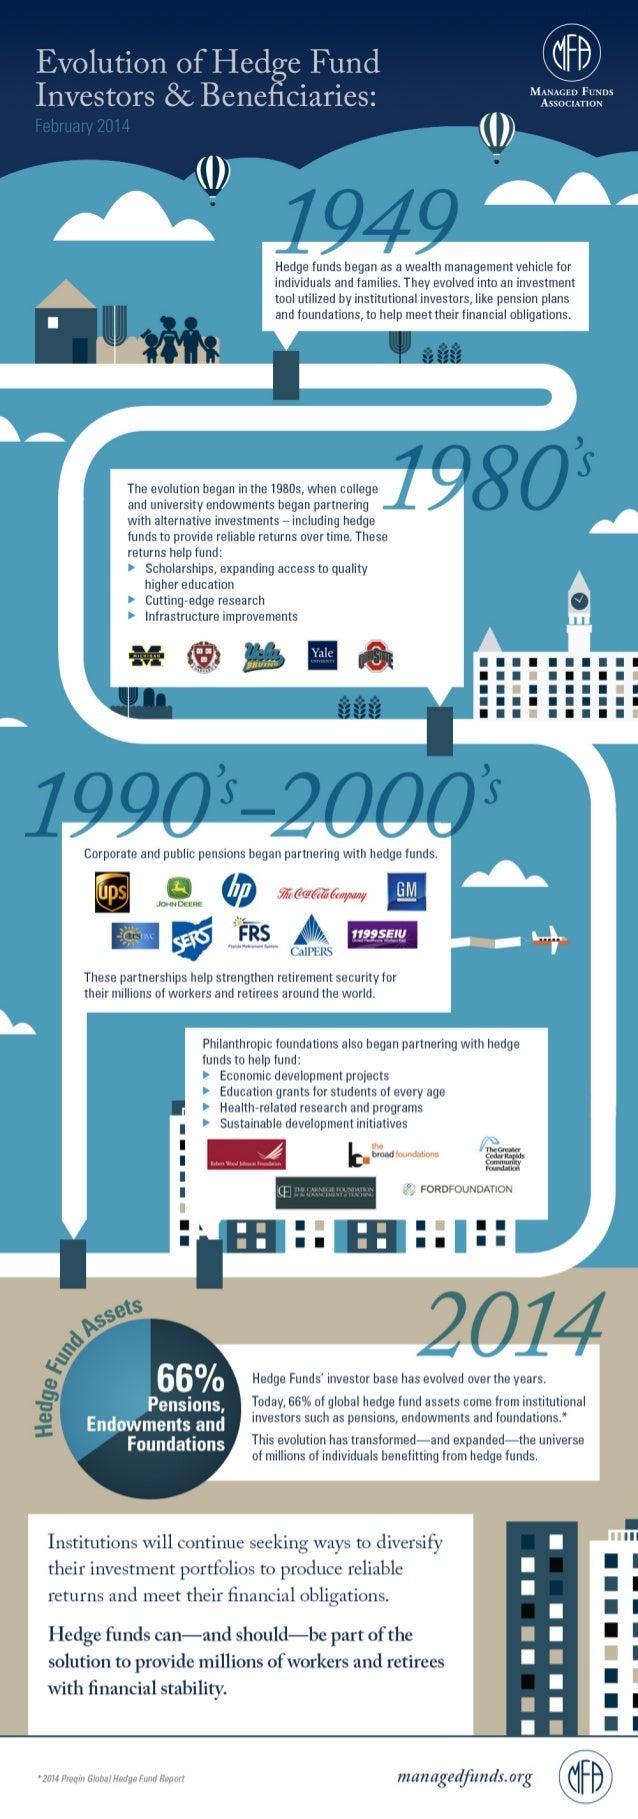 Evolution of Hedge Fund Investors & Beneficiaries Infographic